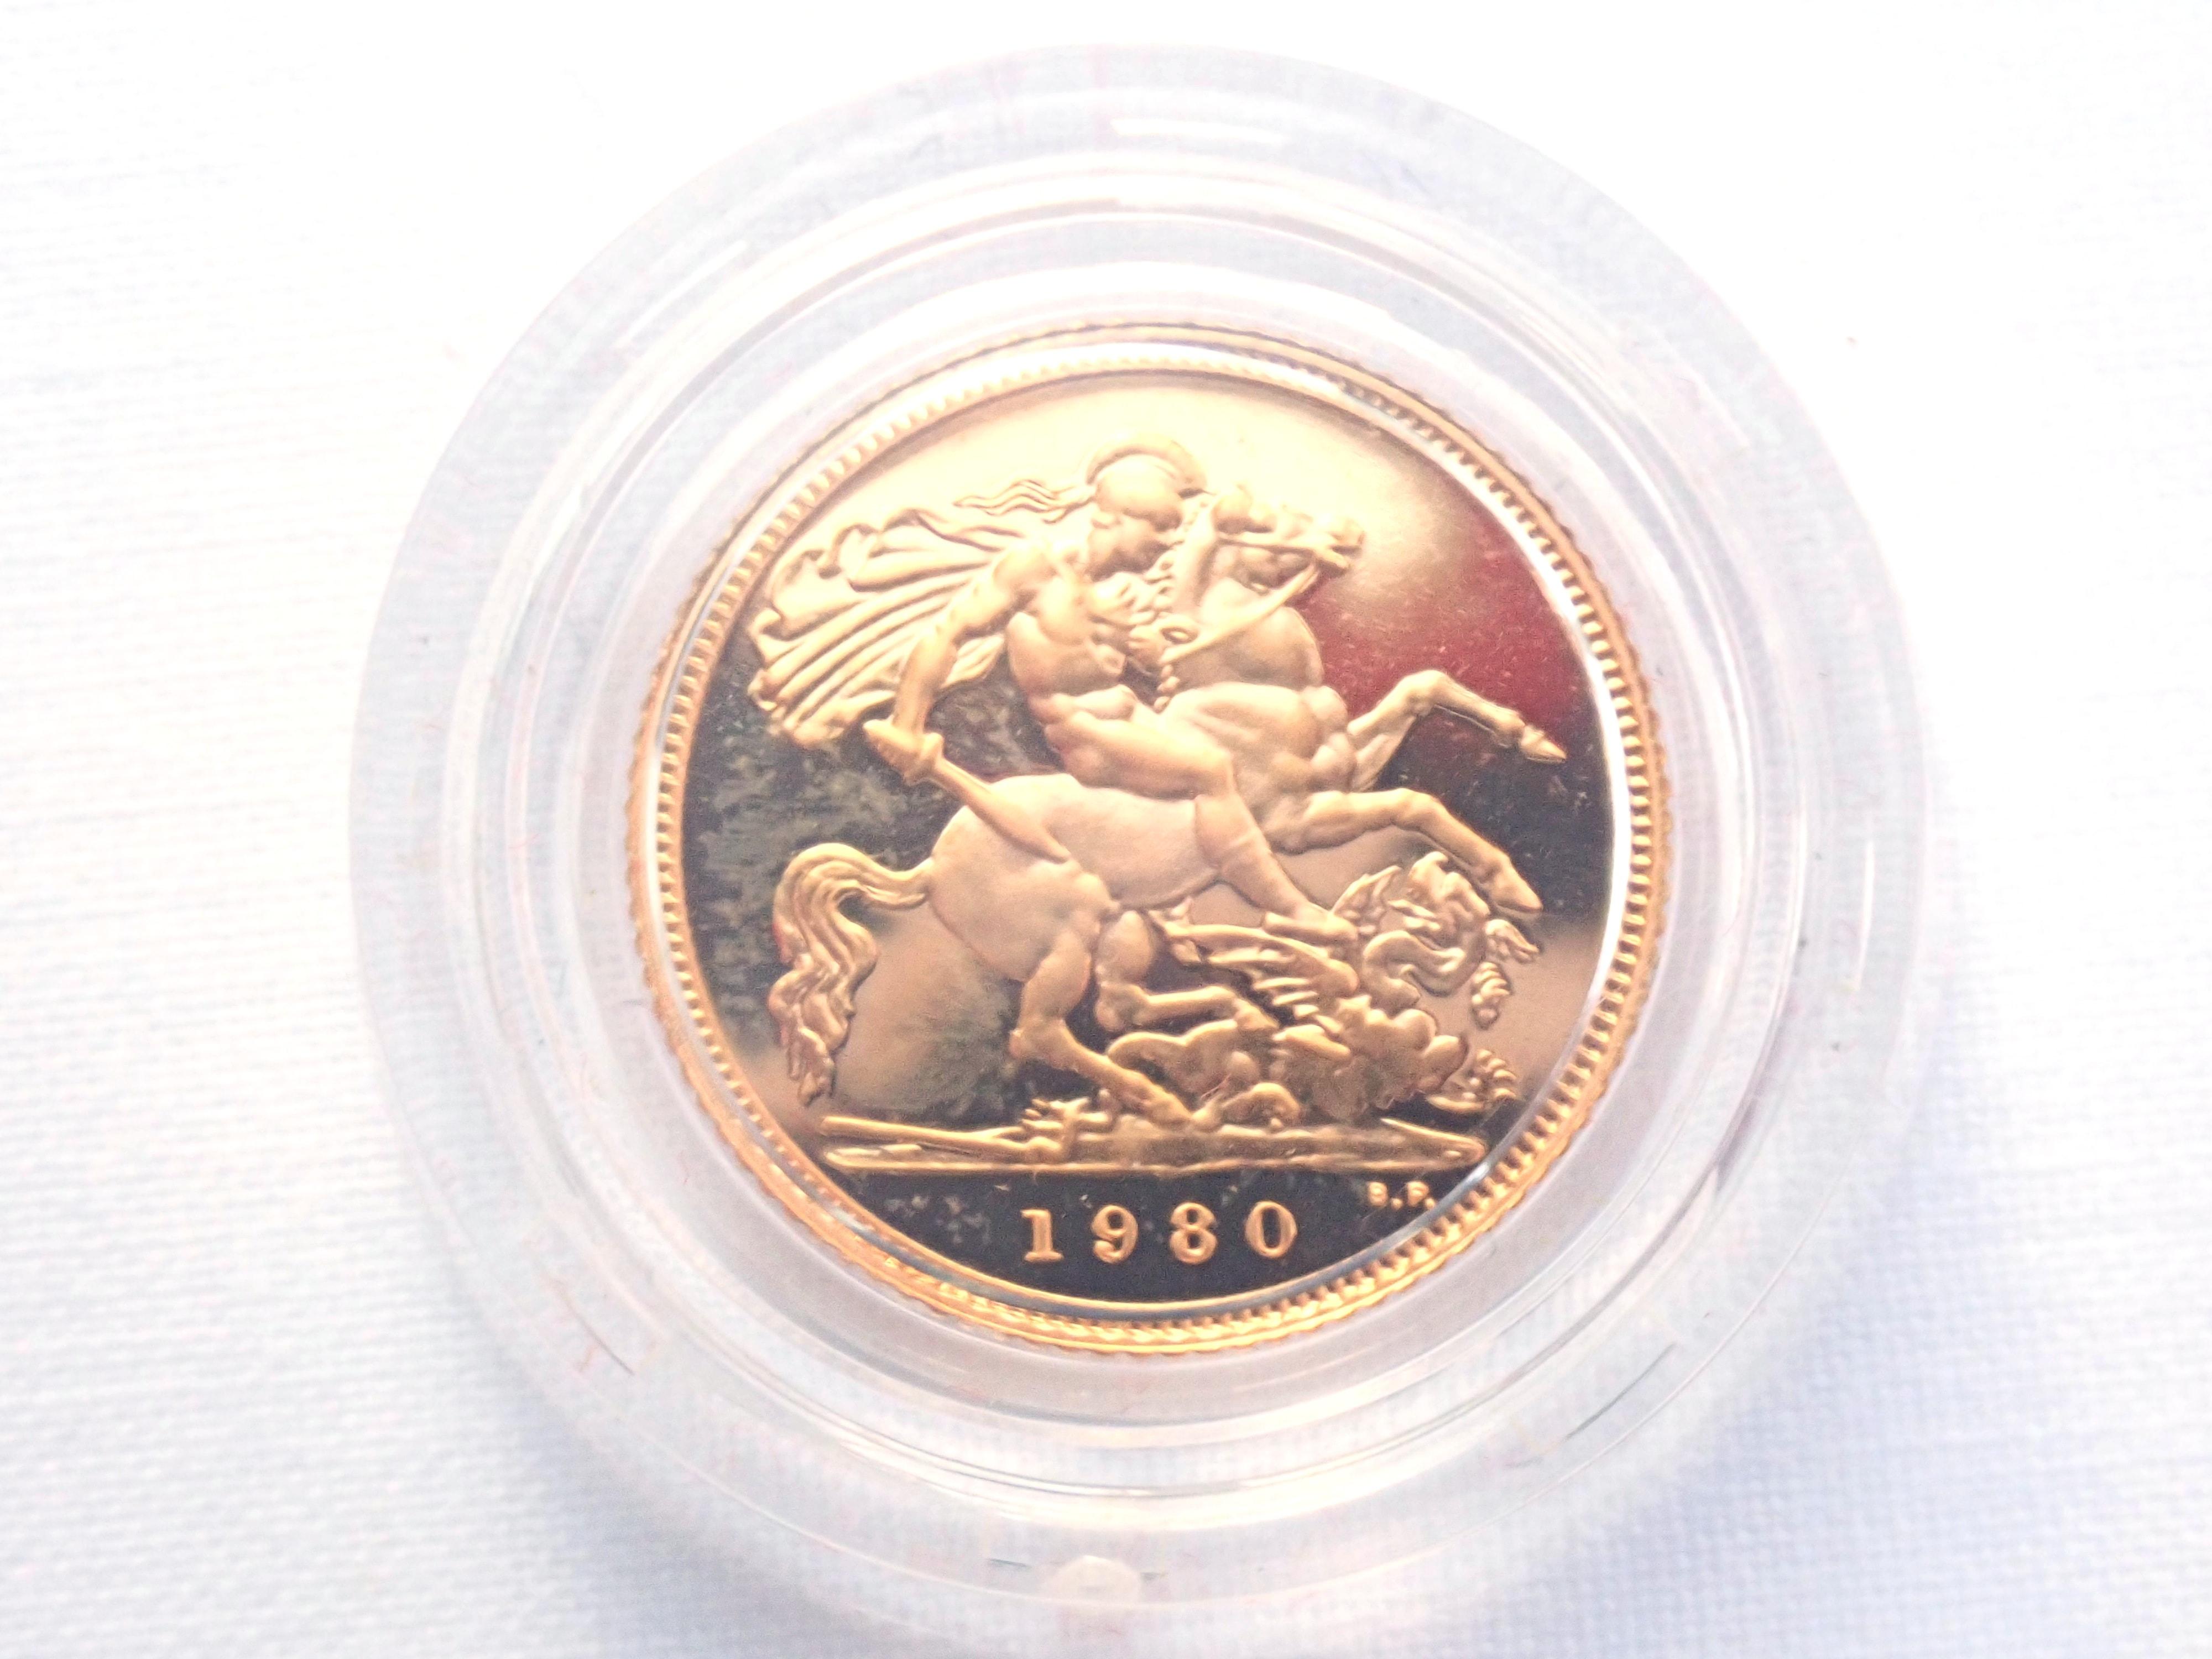 AA000699 - 1980 Proof Gold Half Sovereign Red Boxed 22k Elizabeth II 2nd Portrait #175